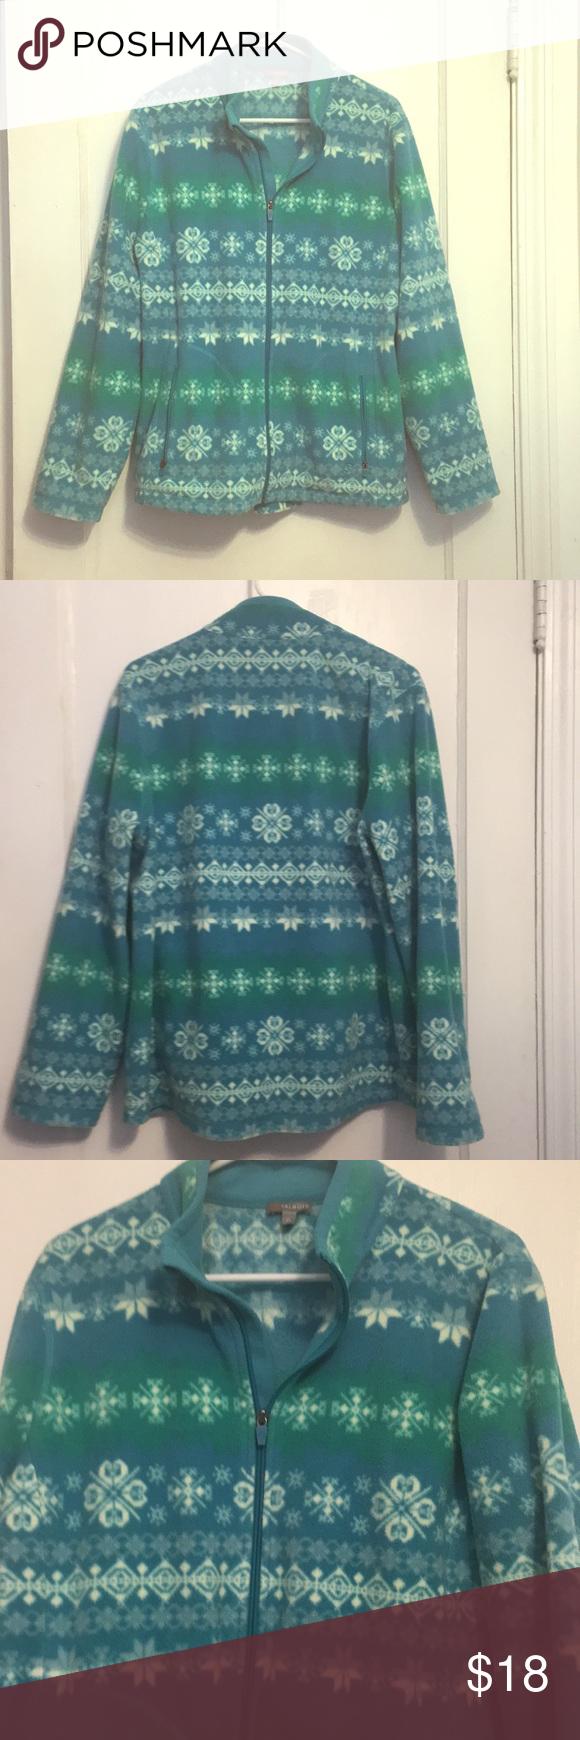 CLEARANCETalbots Turquoise Snowflake Fleece Pinterest